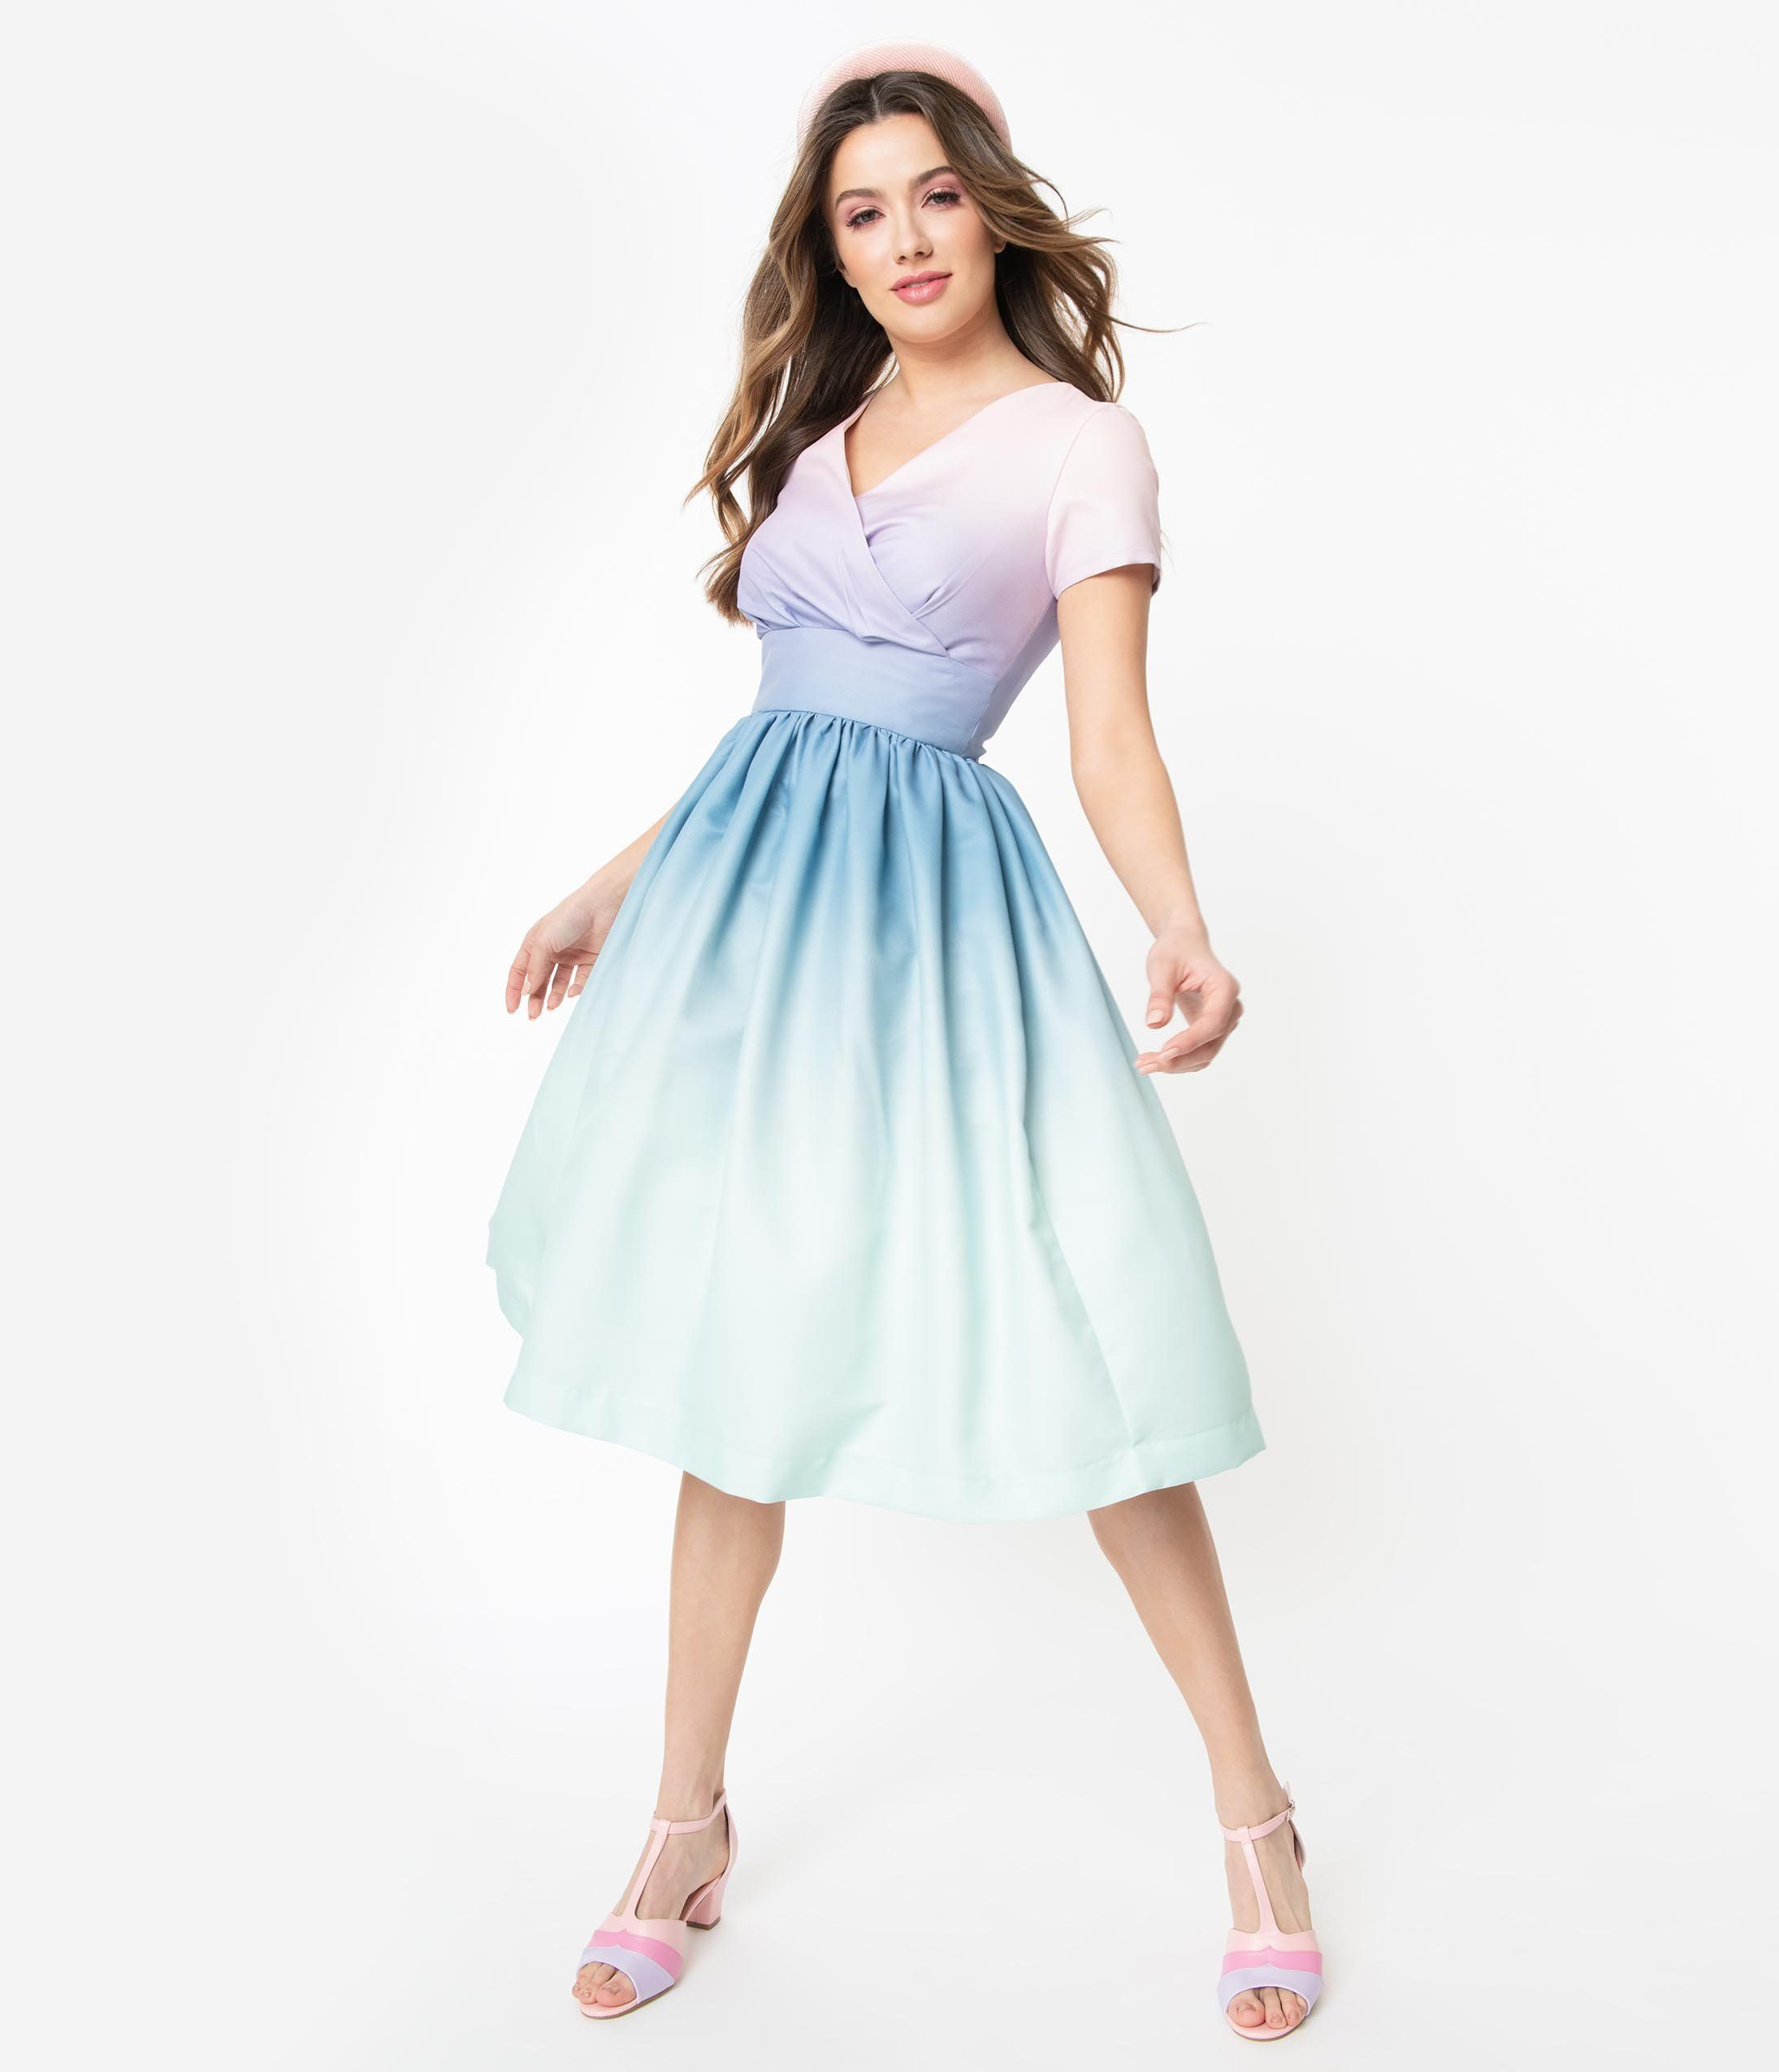 Pastel Ombre Alyssa Swing Dress In 2020 Swing Dress Unique Dresses Vintage Dresses